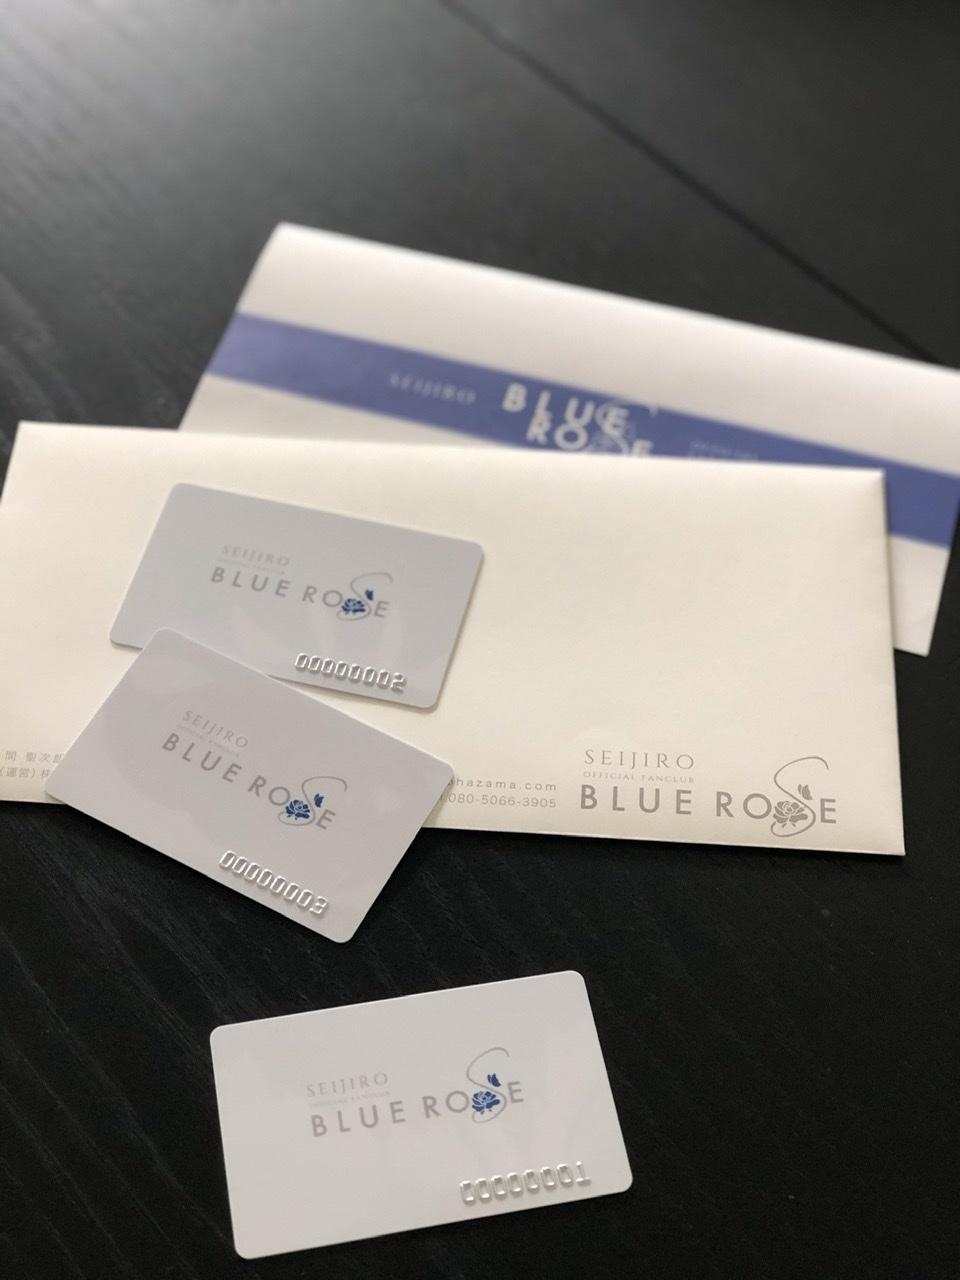 Seijiroオフィシャルファンクラブ「BLUE ROSE」設立記念 オープニングキャンペーン実施中です♡_a0157409_21562150.jpeg